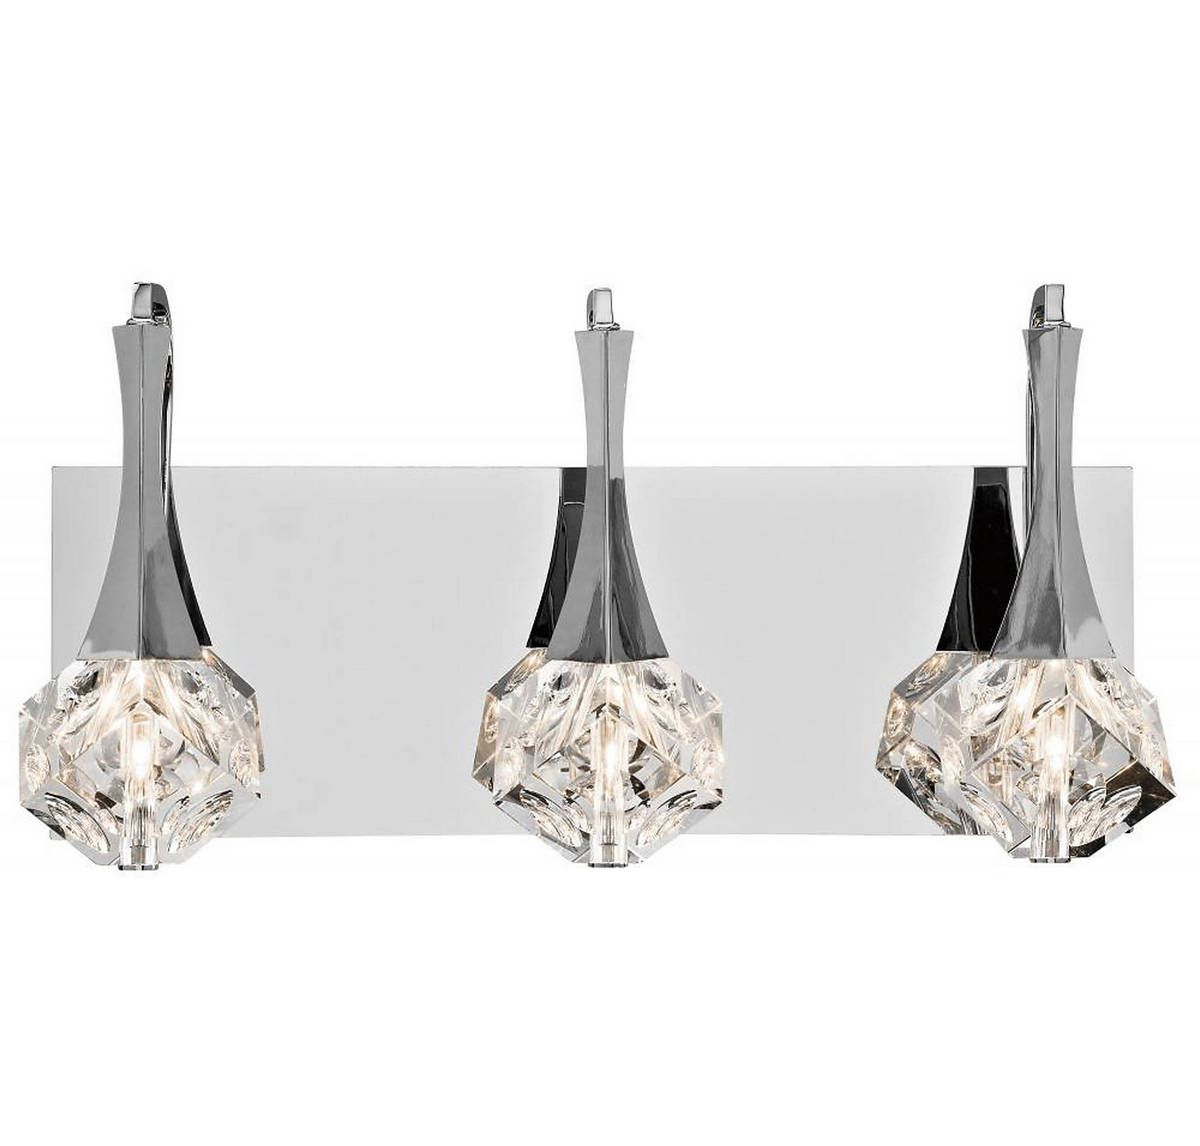 Elan Rockne 17 8 3 Light Crystal Bathroom Vanity Light In Chrome